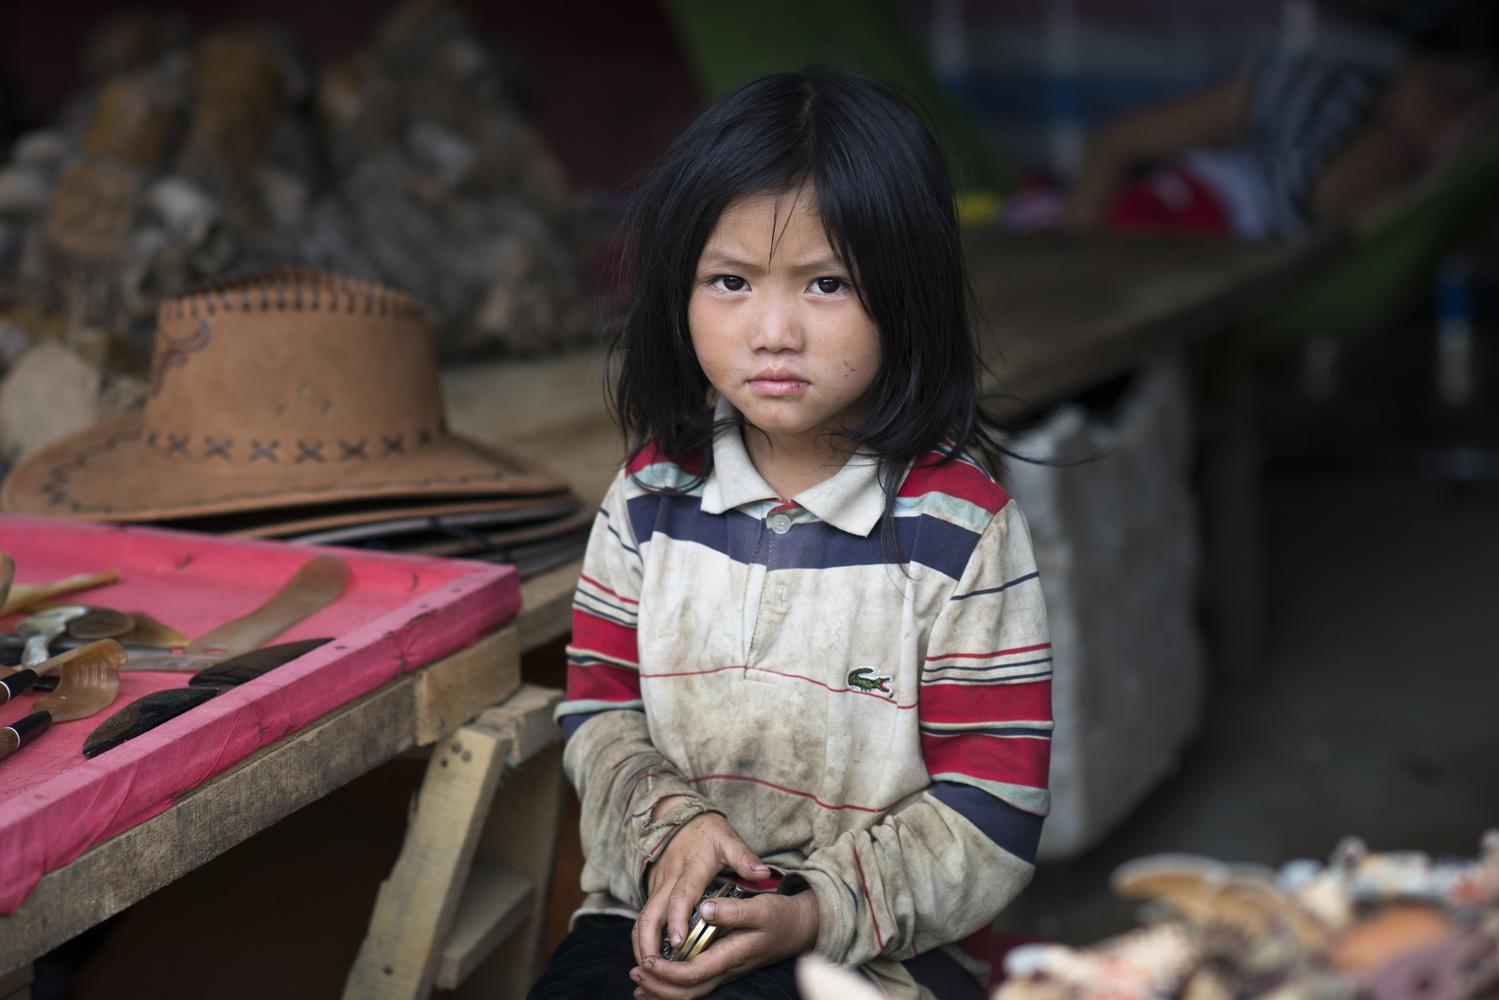 A nice vietnamese girl in Sapa, Vietnam by Léonard Rodriguez